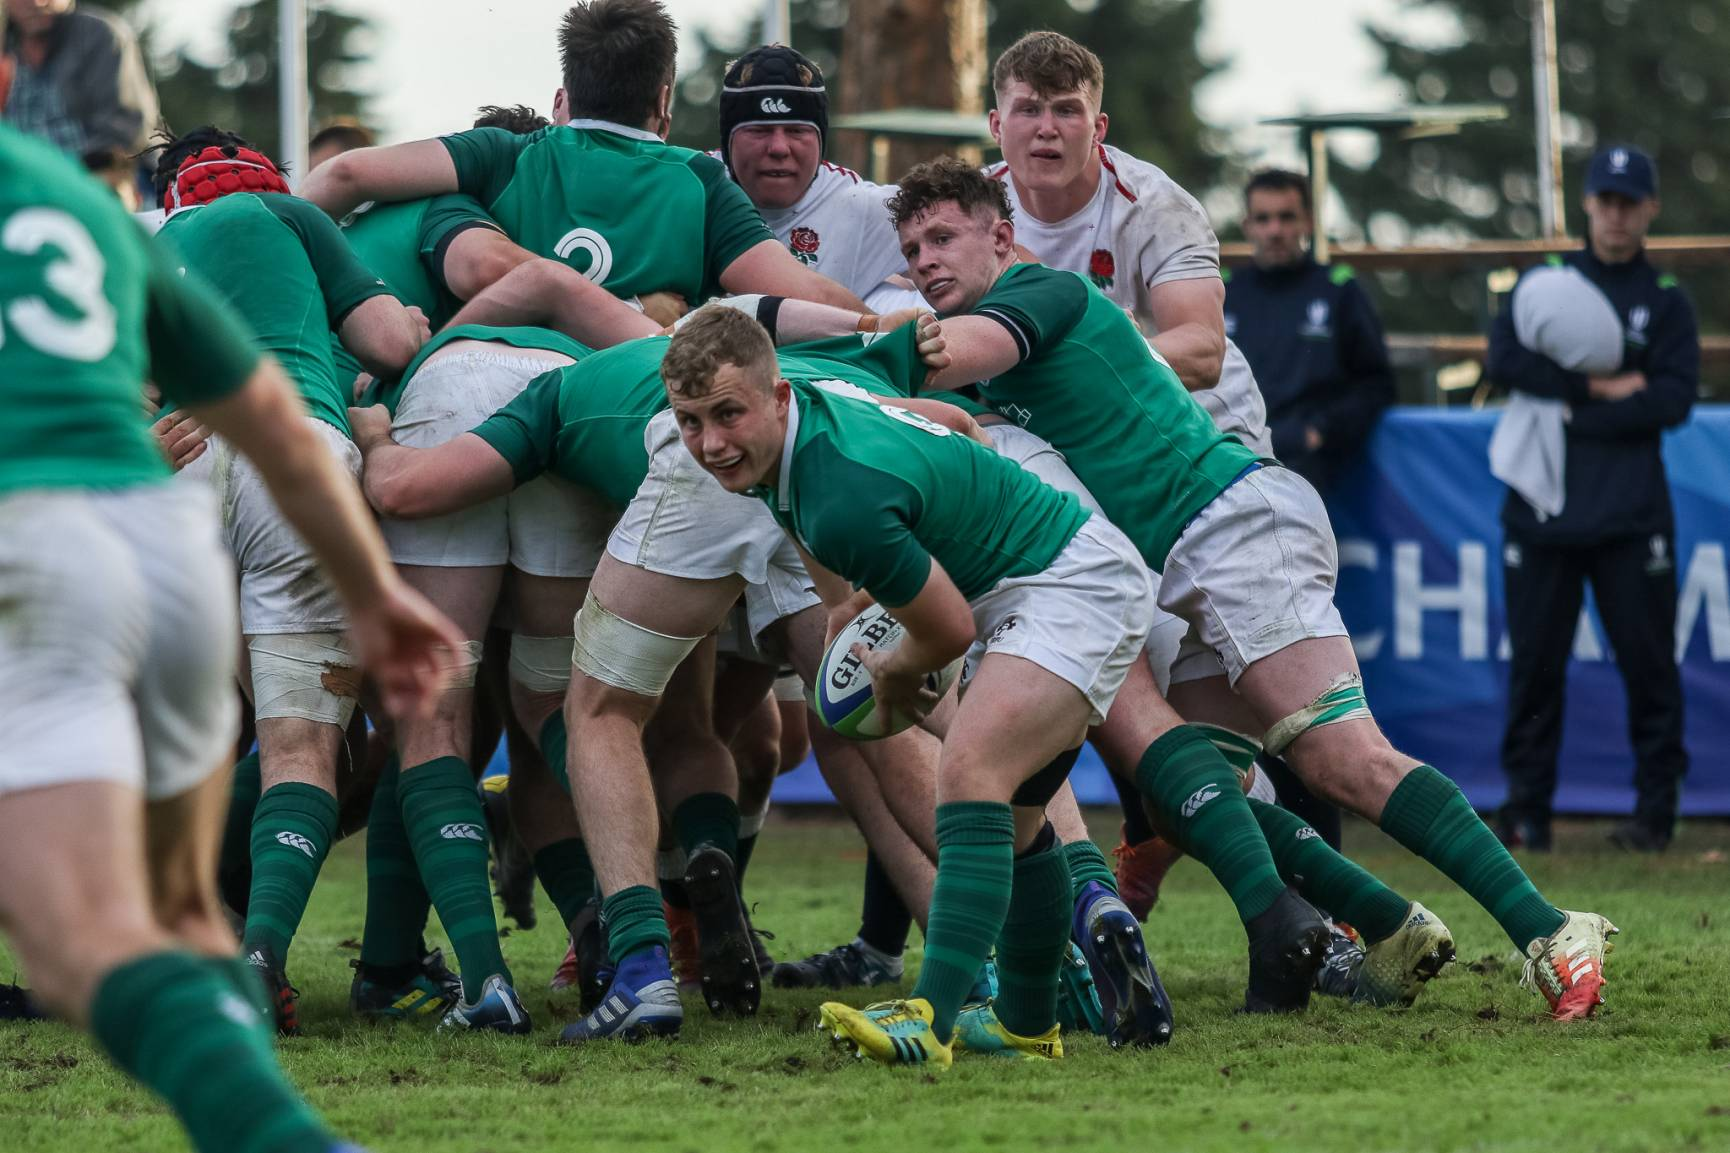 World Rugby Under-20 Championship Preview: Australia U-20s v Ireland U-20s